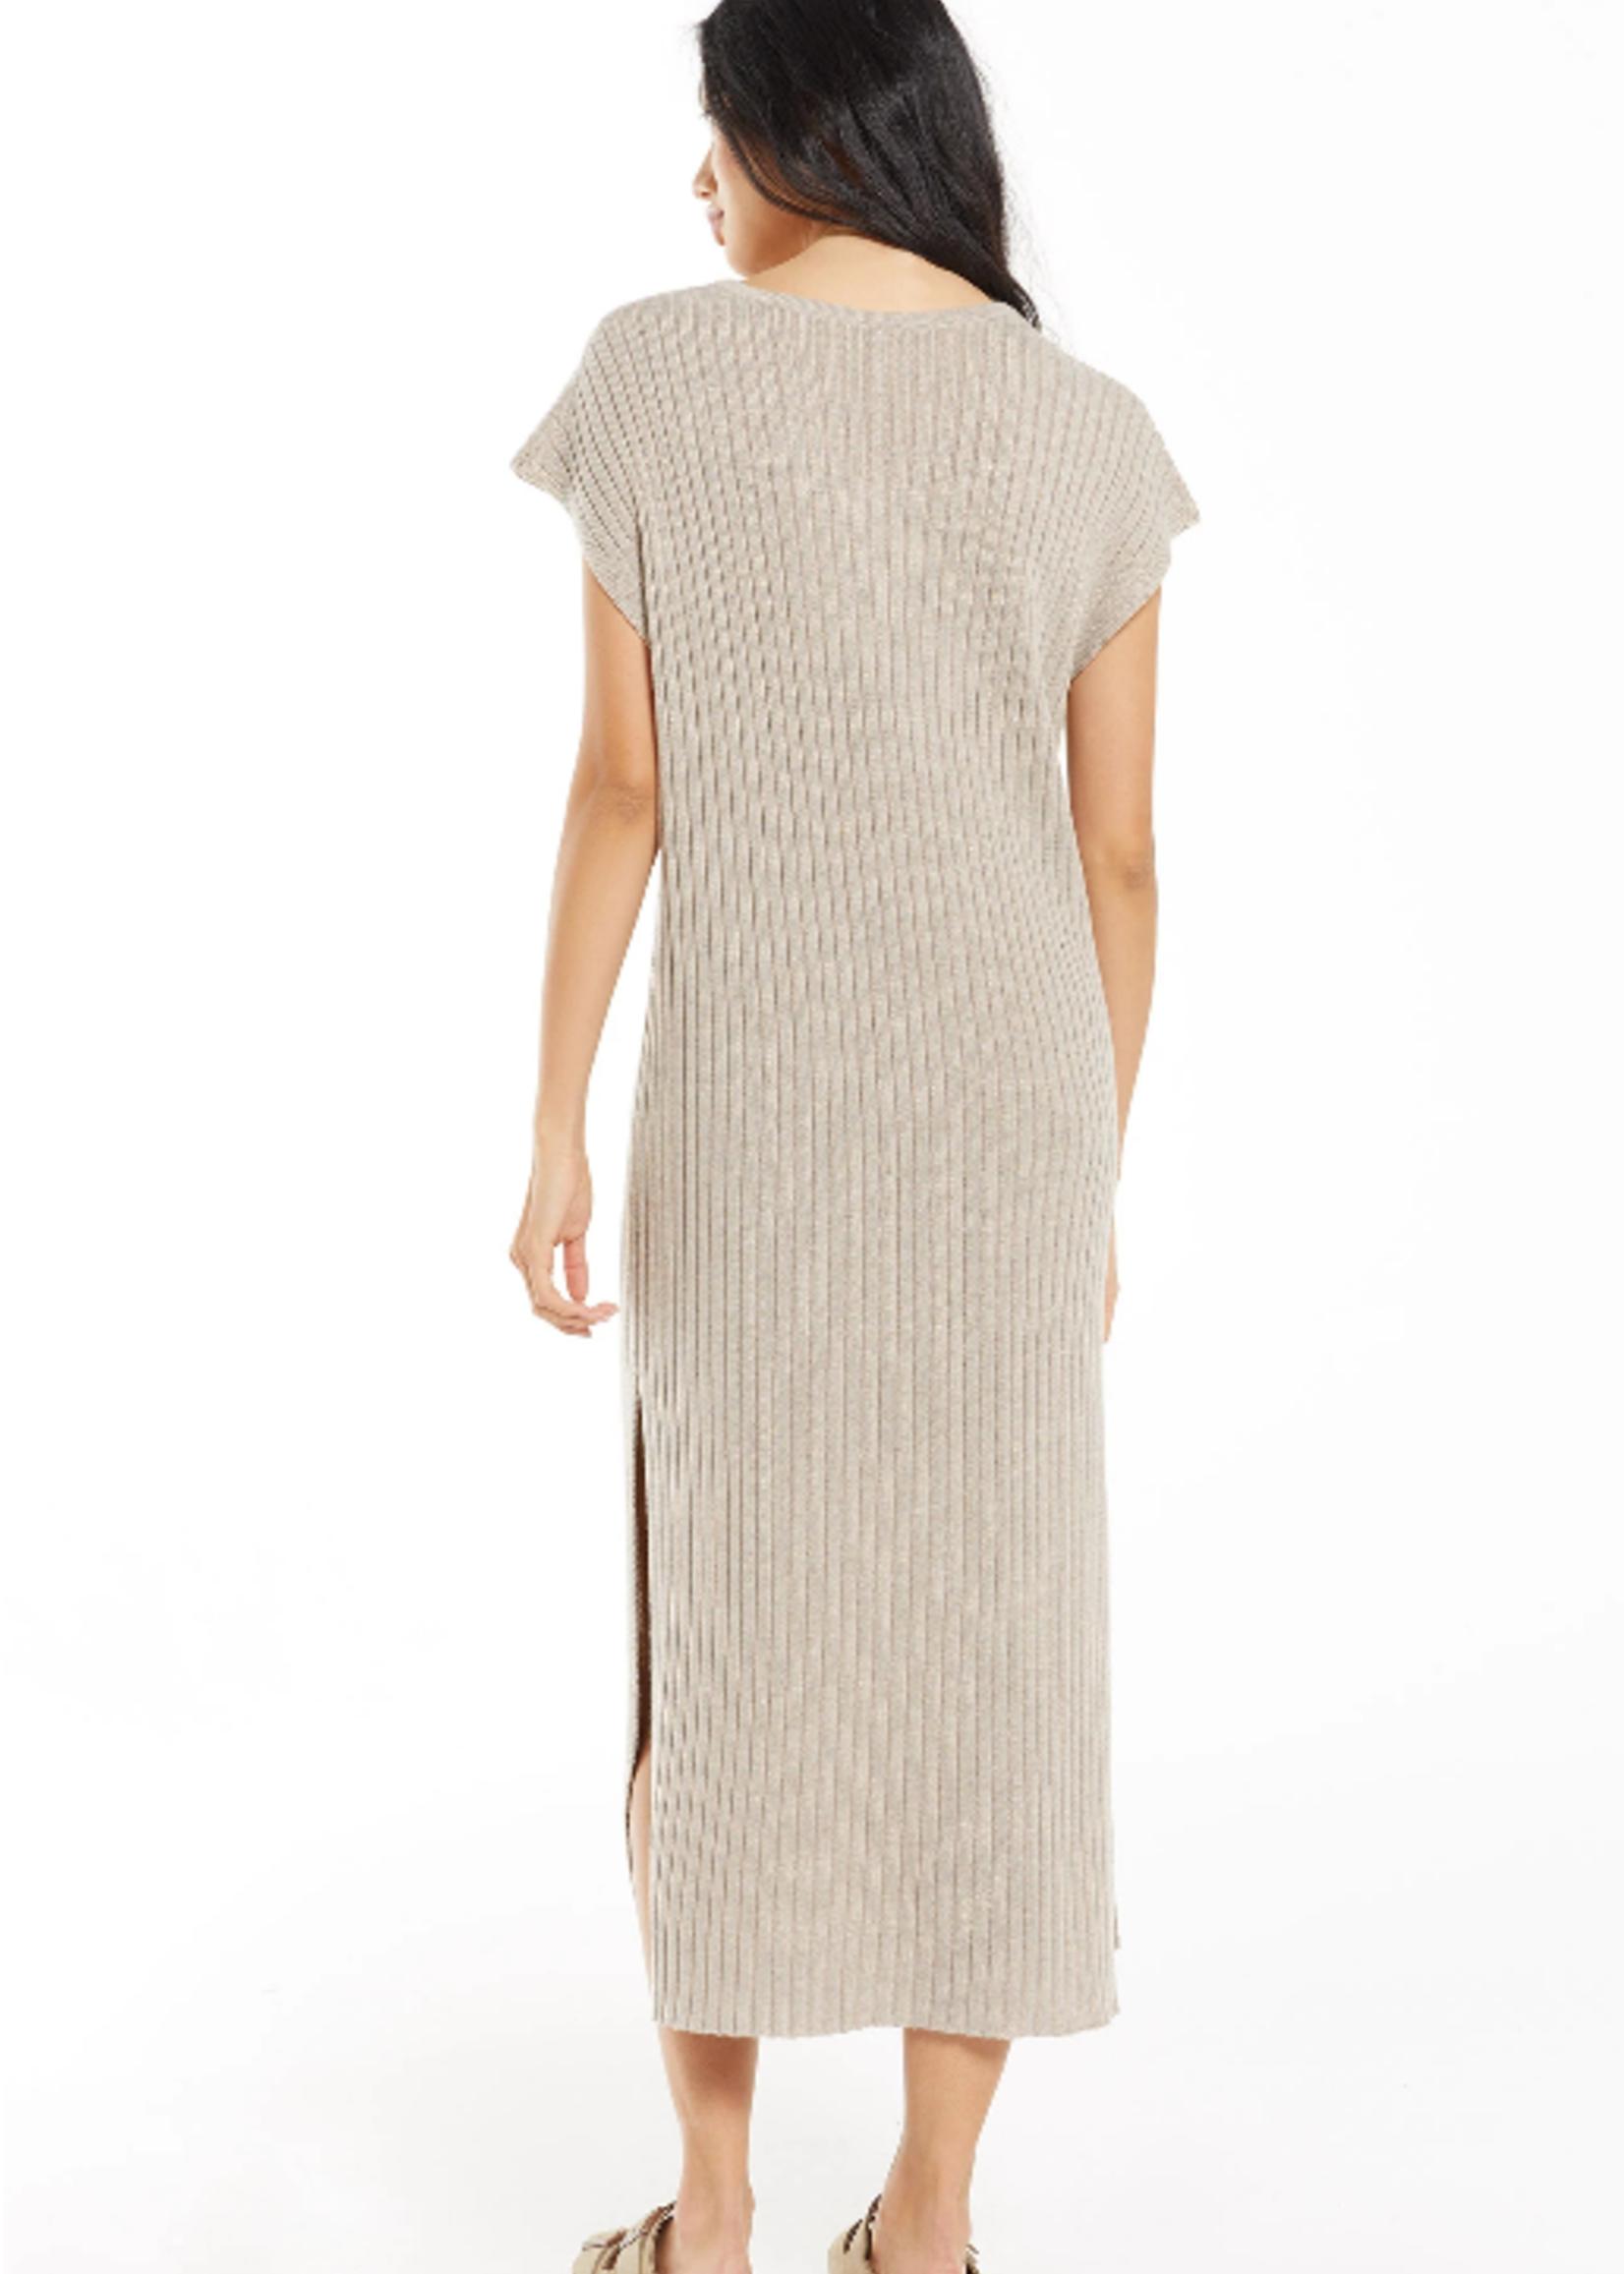 Z Supply WFH Sweater Dress - Heather Latte